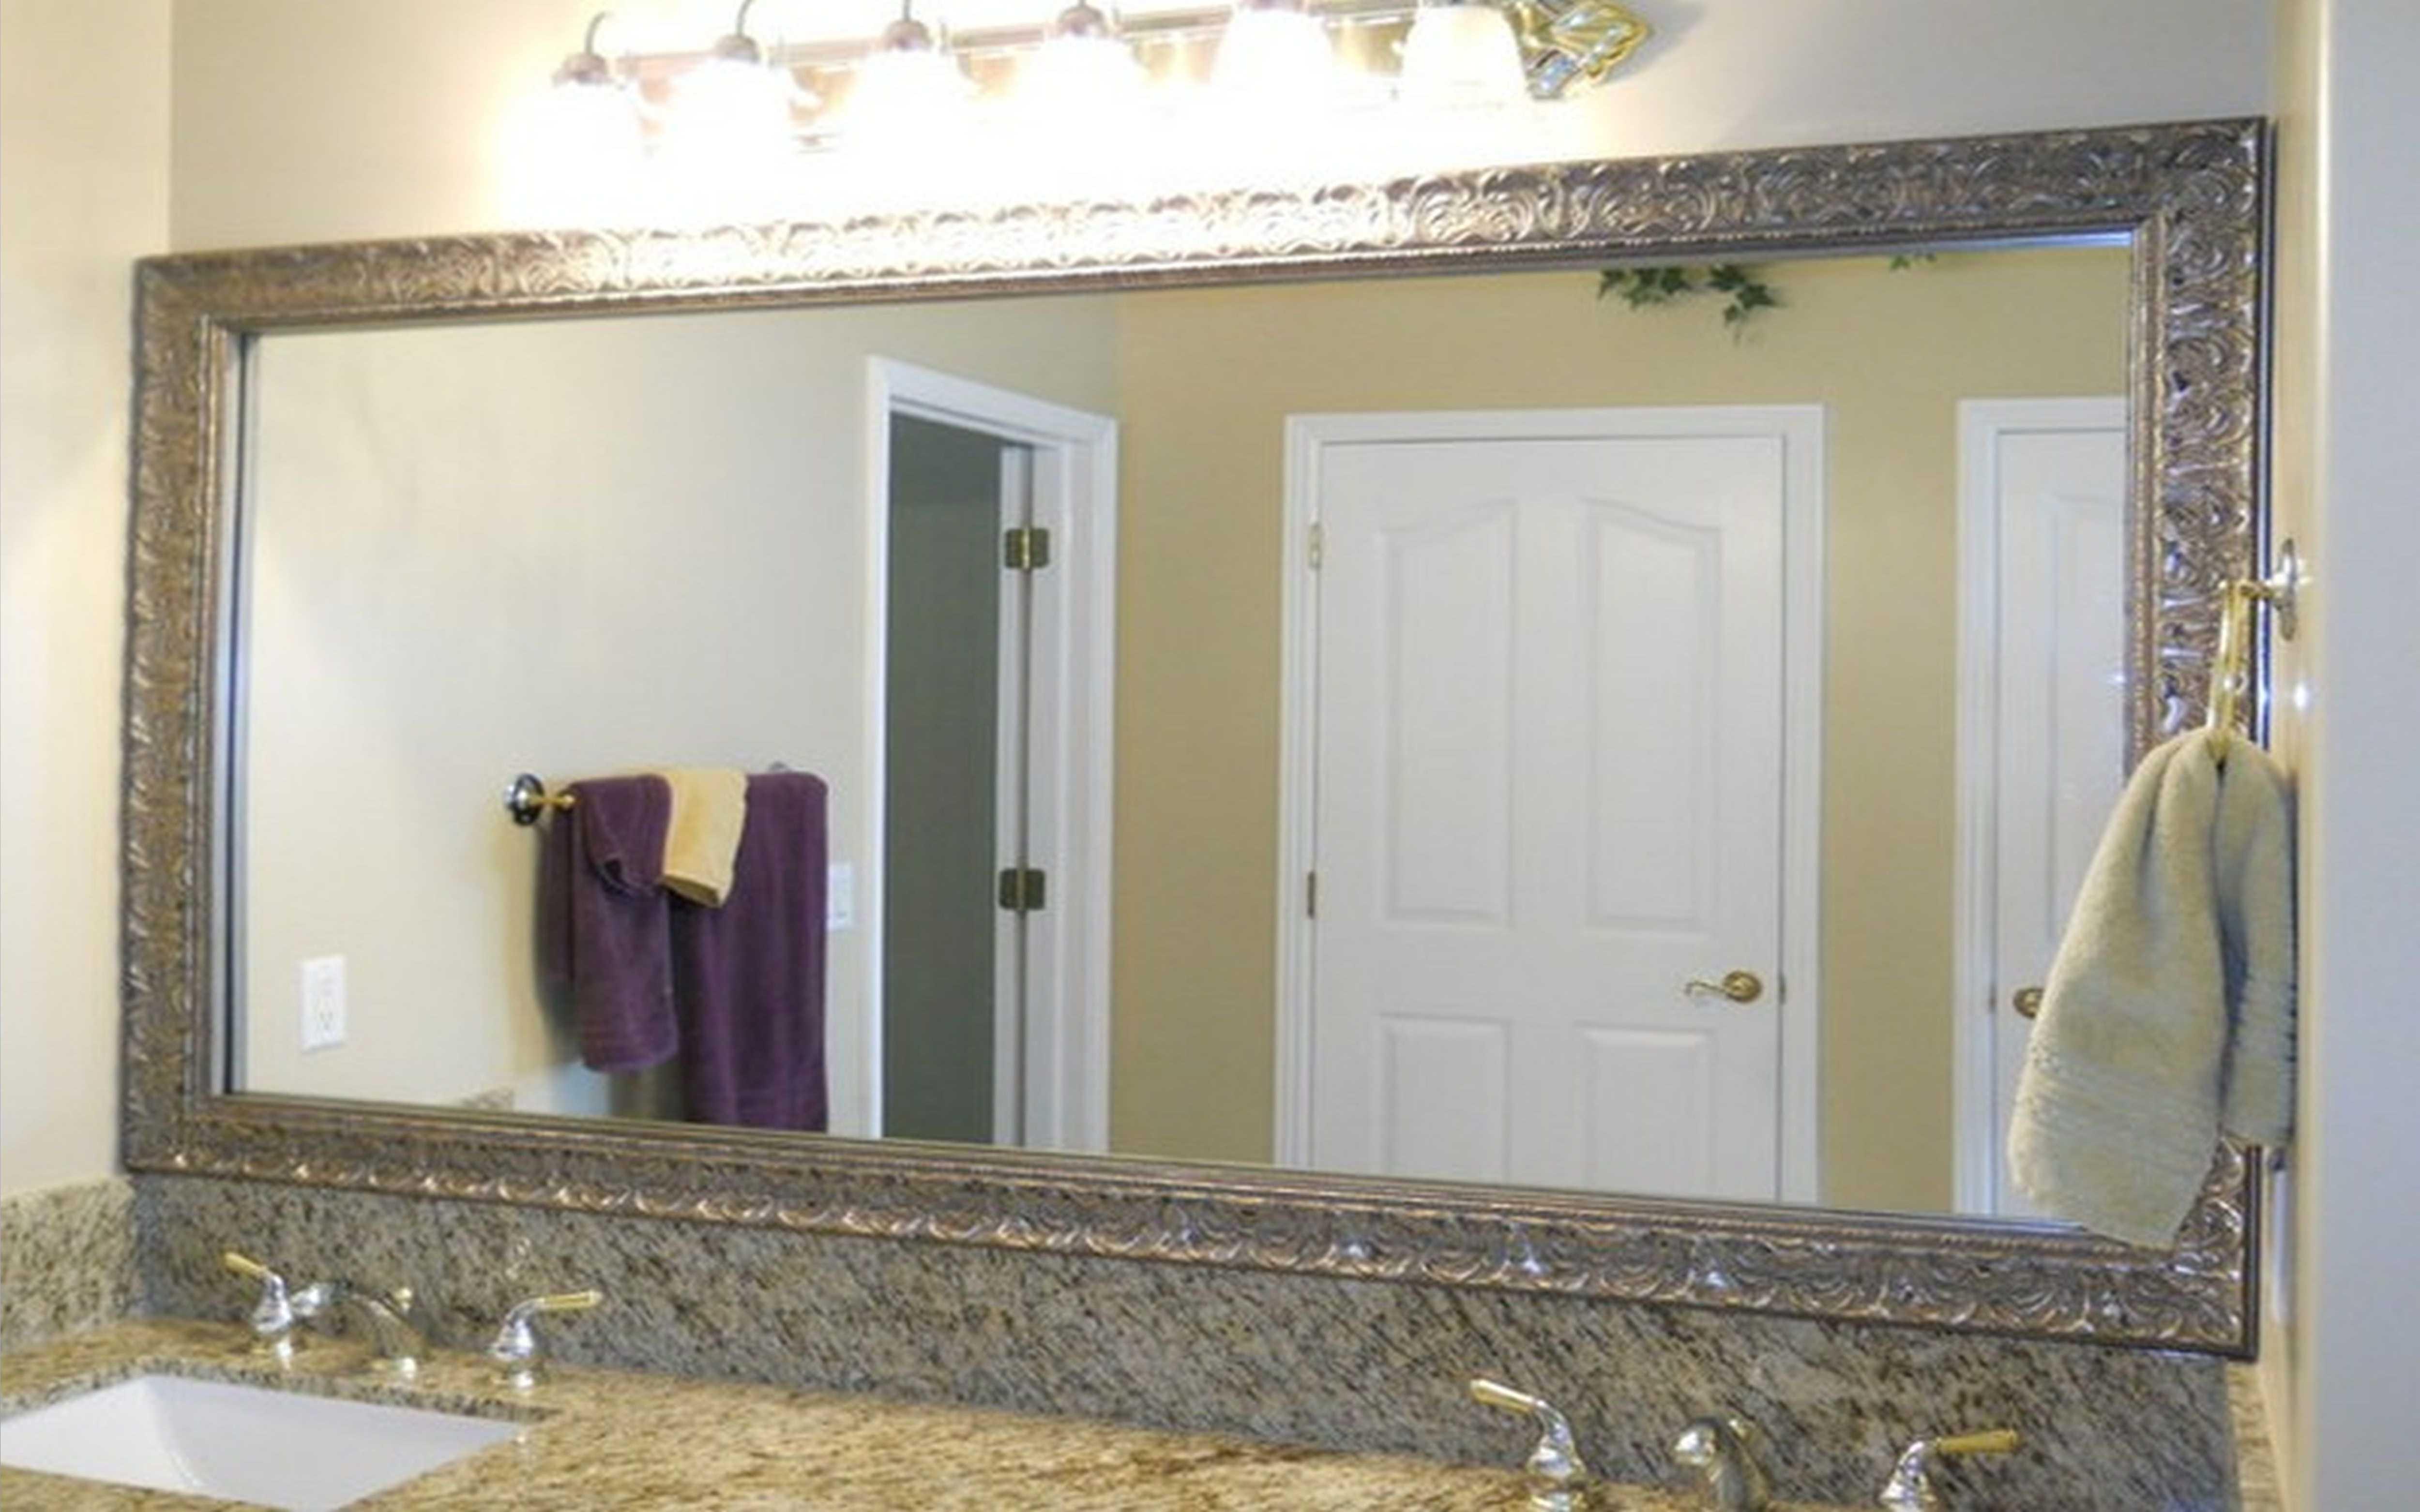 Bathroom Mirrors Framed Or Unframed